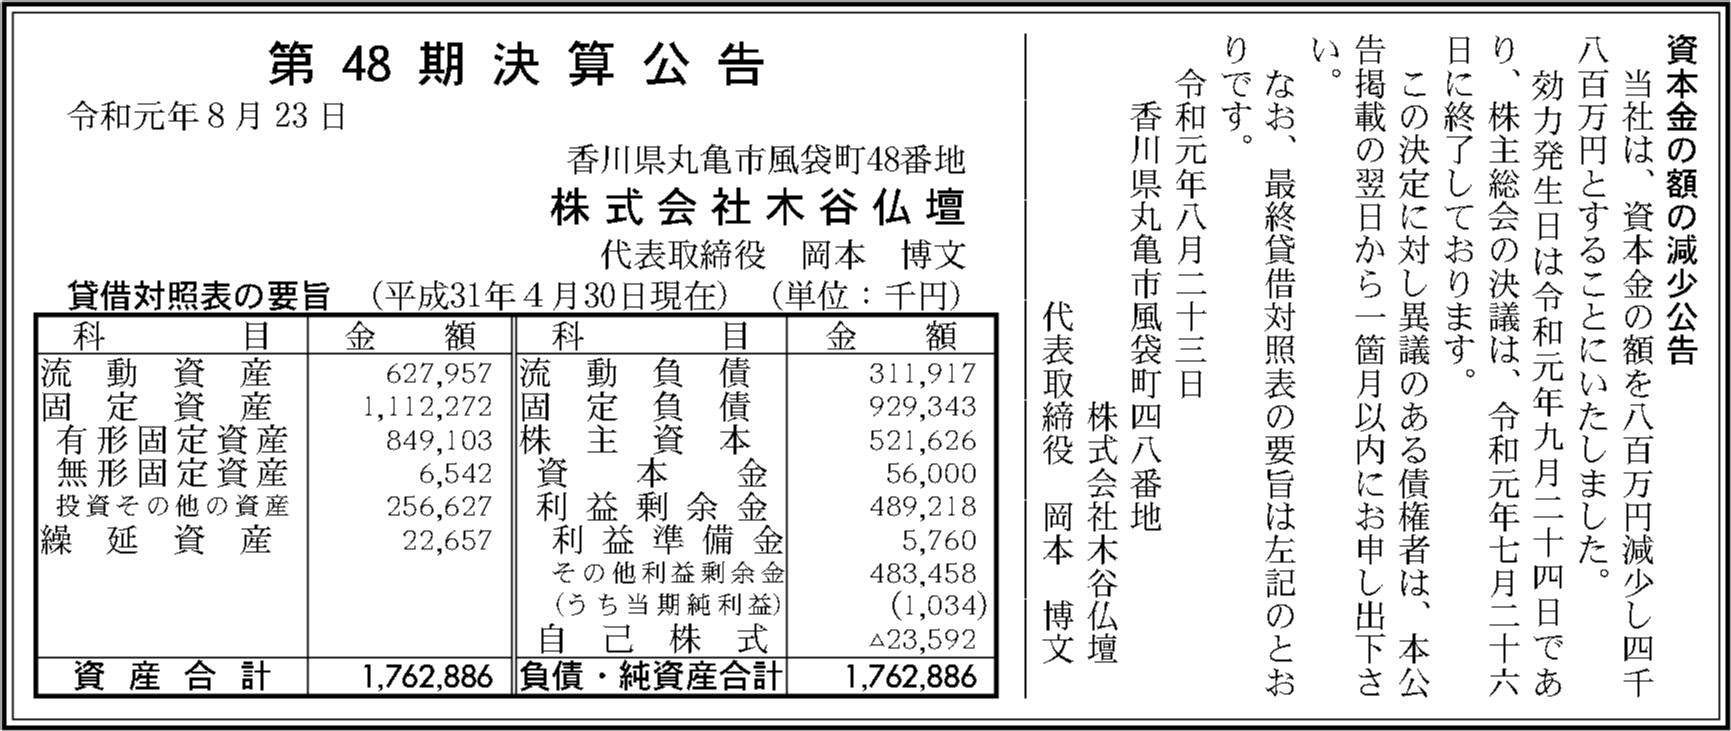 0114 87b87318c33723ef7e2aeec1416d930f0b165d19677150fc6c3471e4d130e3a587f9c1e2f1315e4a78ee2b828d7698b72f1507c079061c2b672c81fcad49b360 01